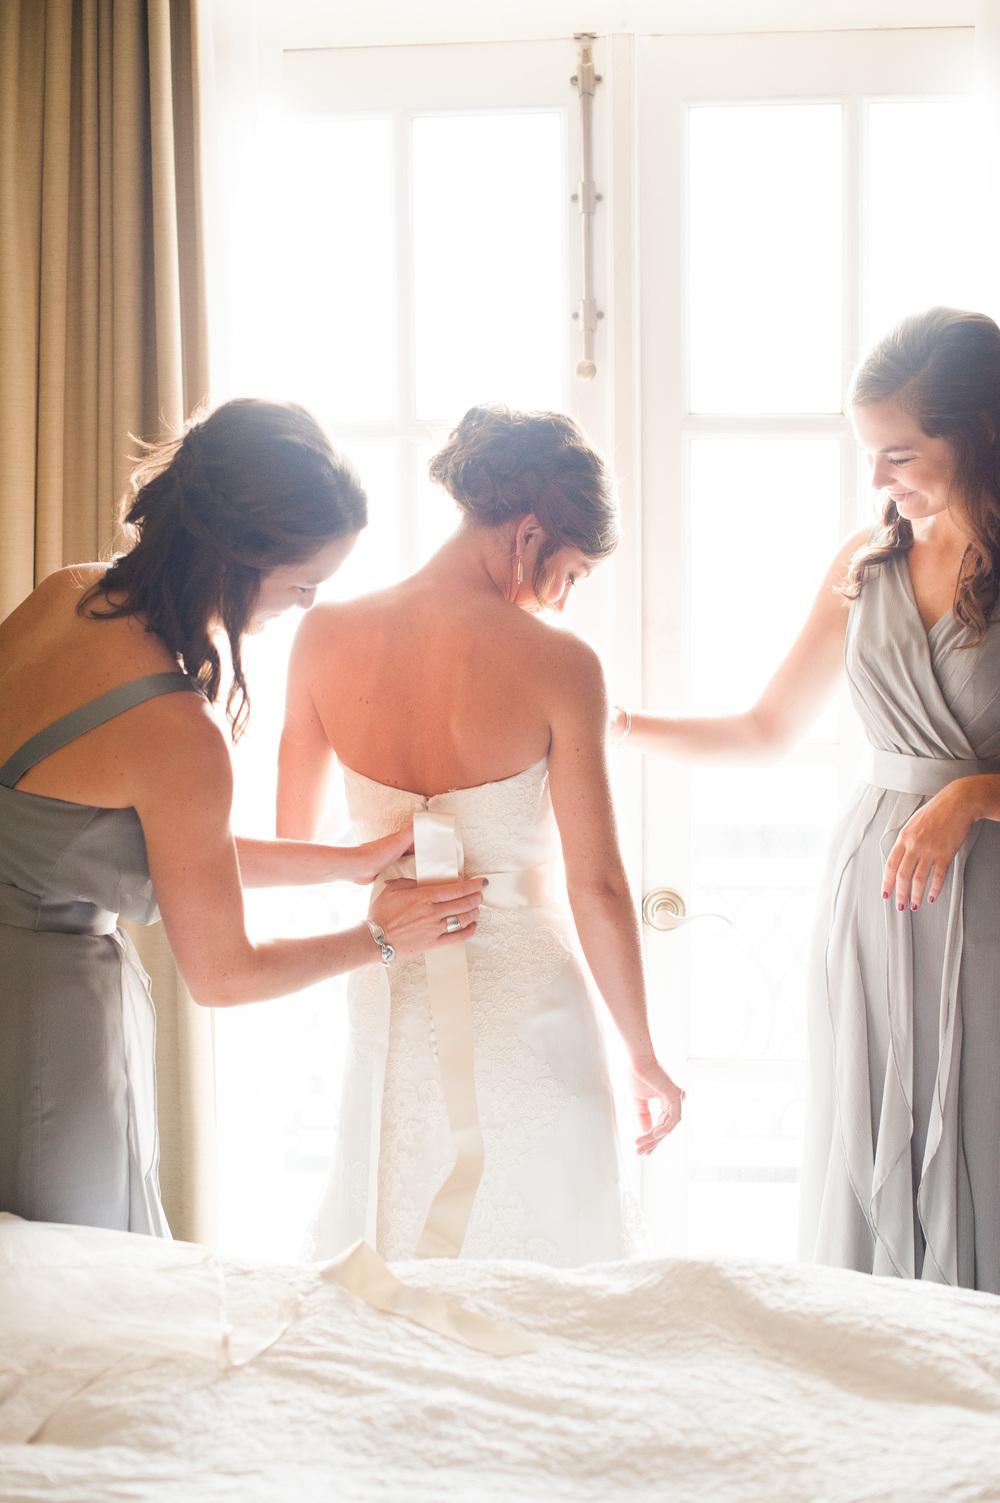 Kathleen & Spencer | Handley Breaux Designs | Spindle Photography | Birmingham Wedding | Alabama Wedding | Southern Wedding | Summer Wedding | Birmingham Wedding Planner